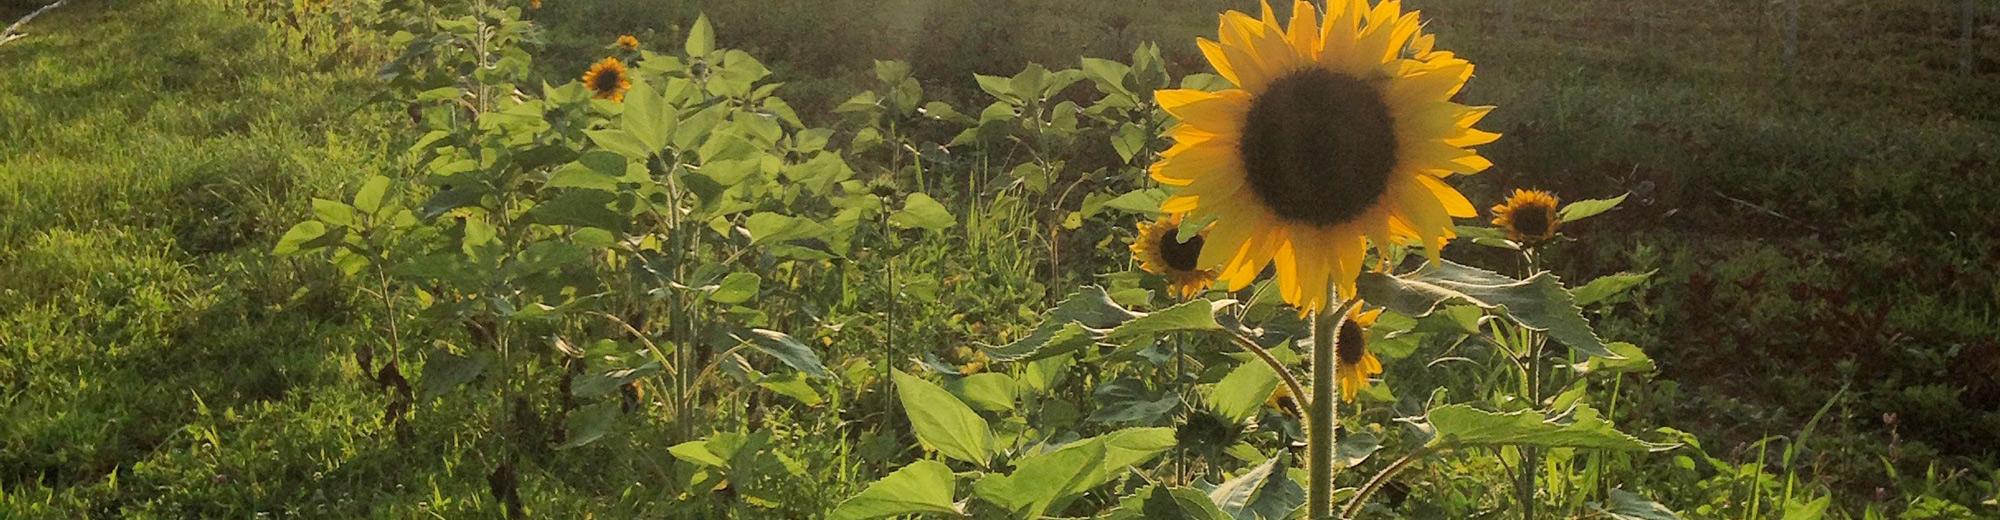 Donattions to Massaro Community Farm helps feed your community